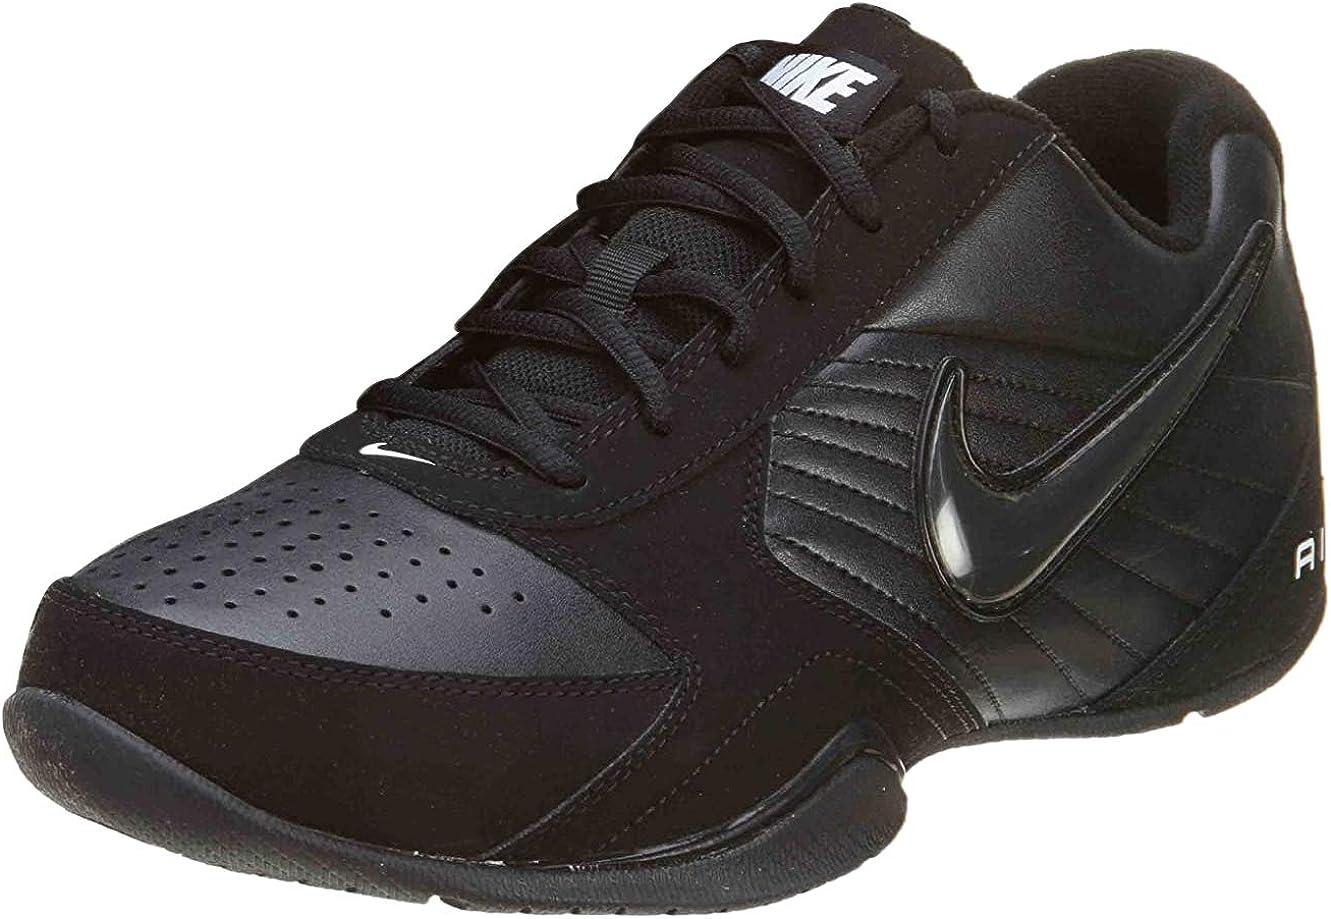 Nike Mens Air Baseline Low Basketball Shoes-White/White-Metallic